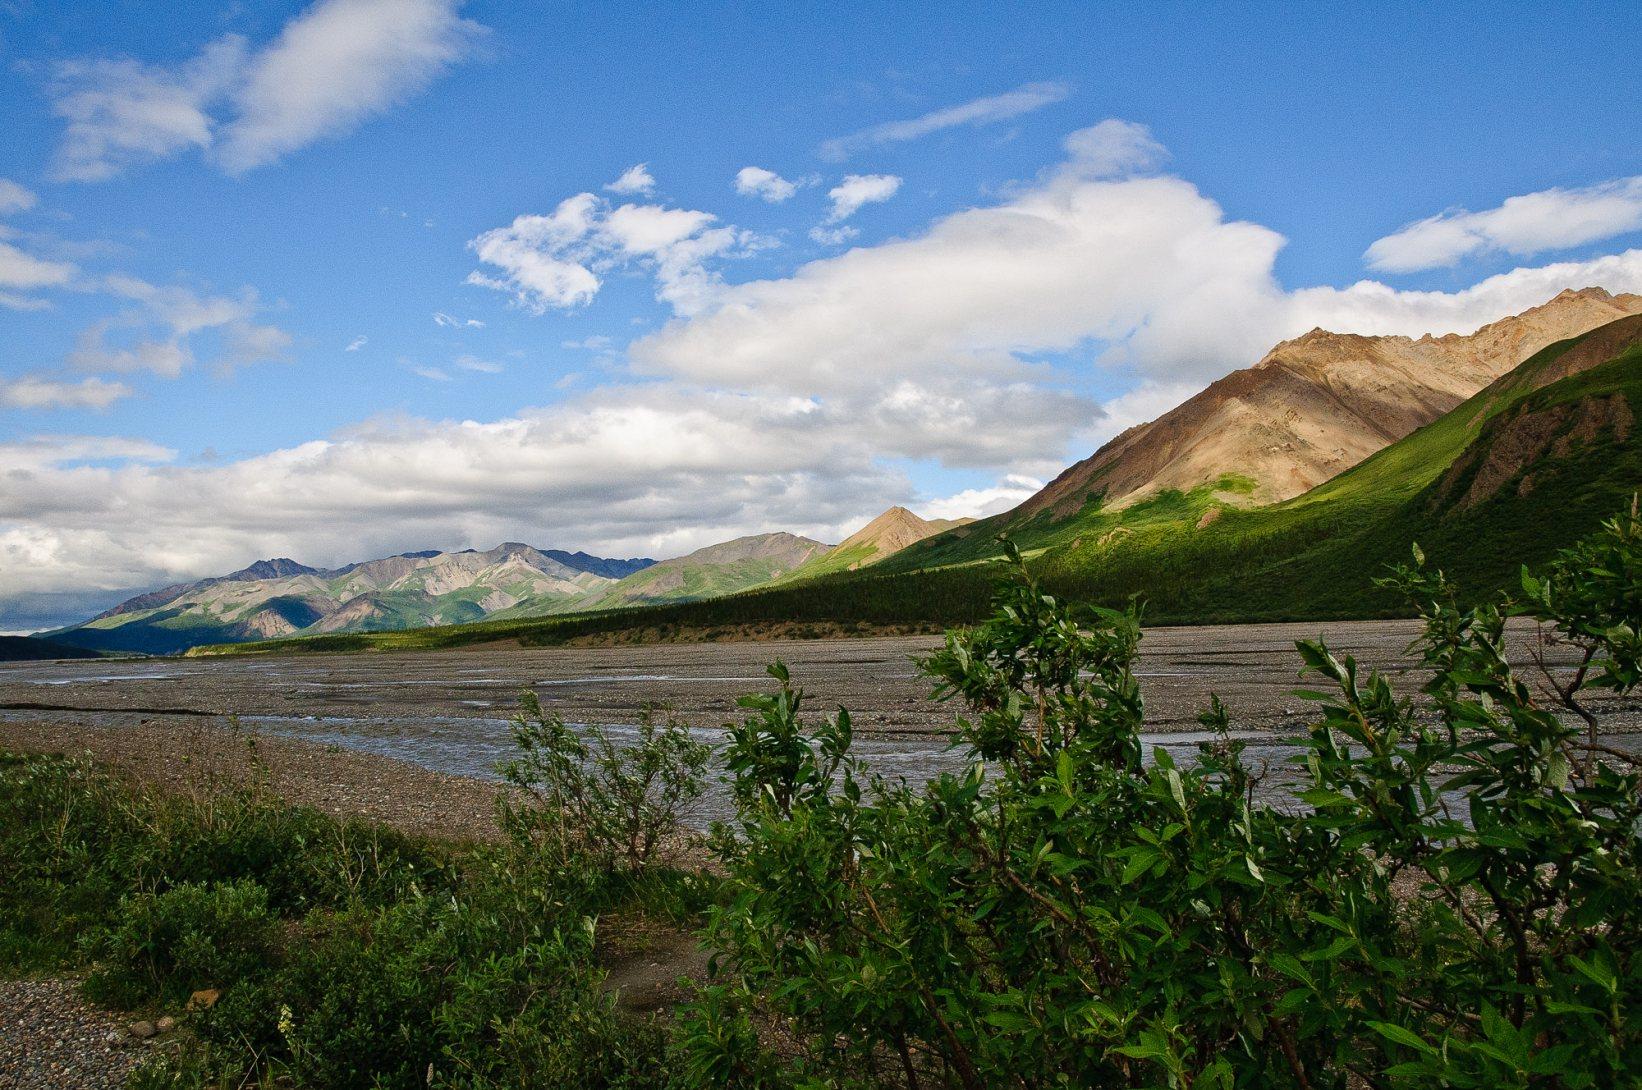 553_Alaska-2010-553.jpg